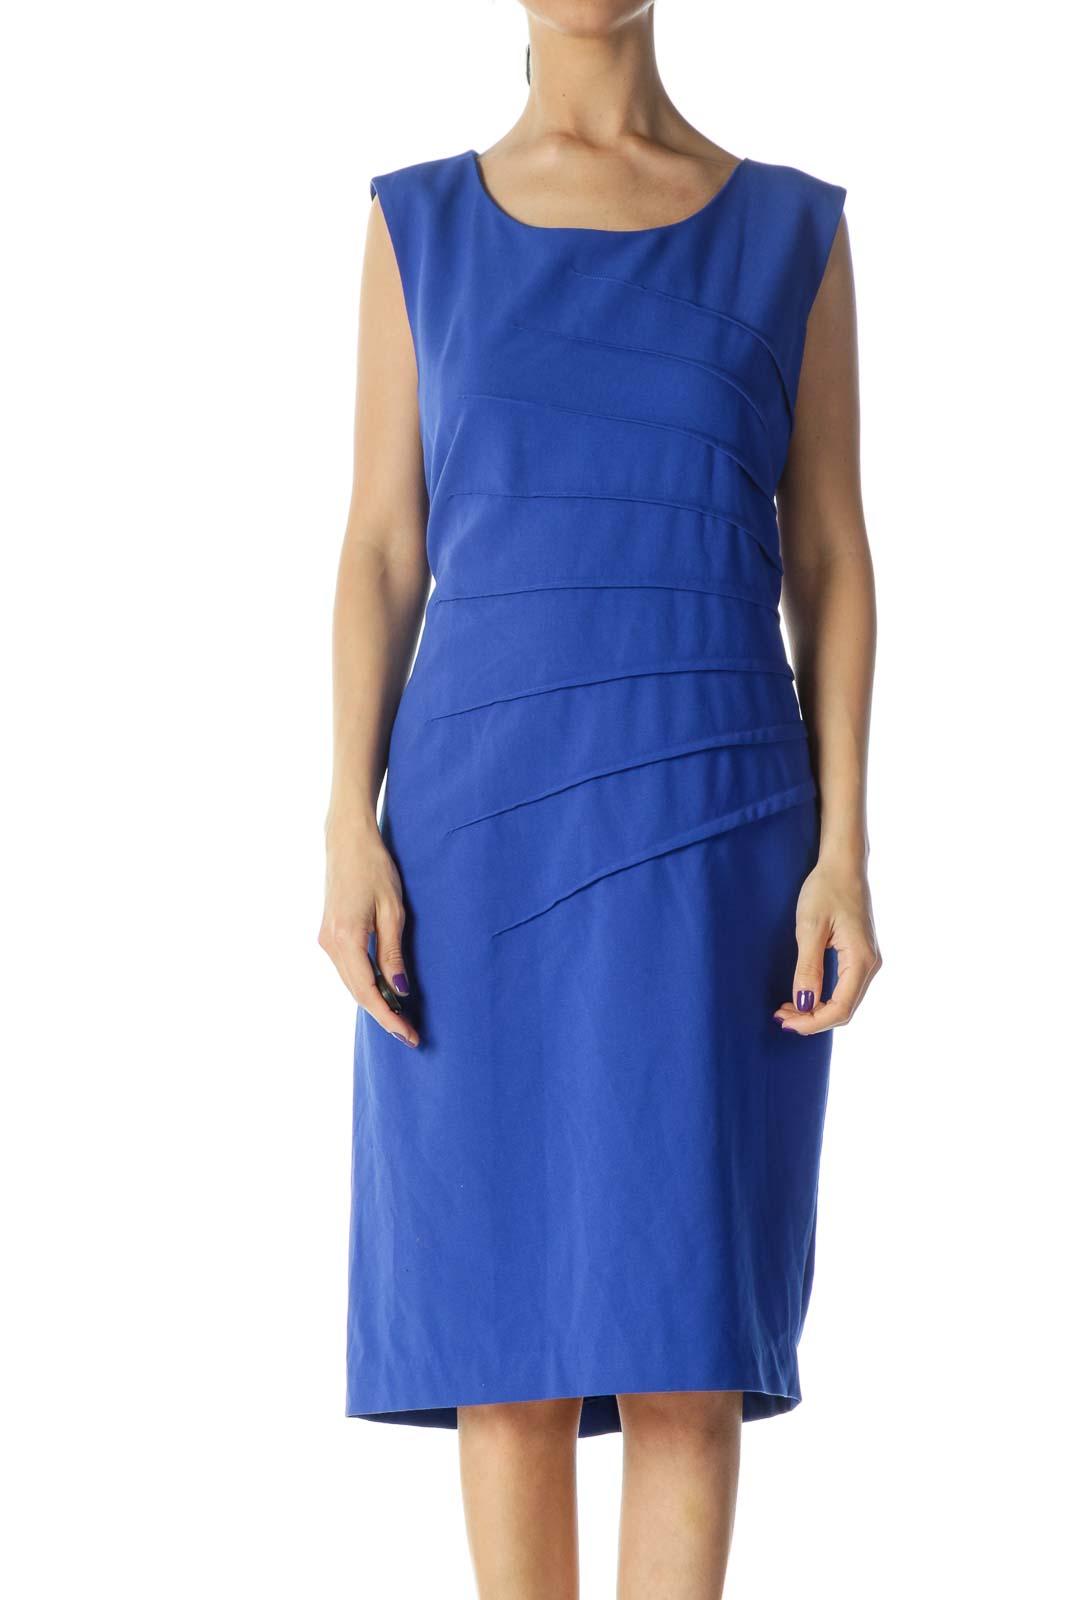 Blue Sheath Work Dress